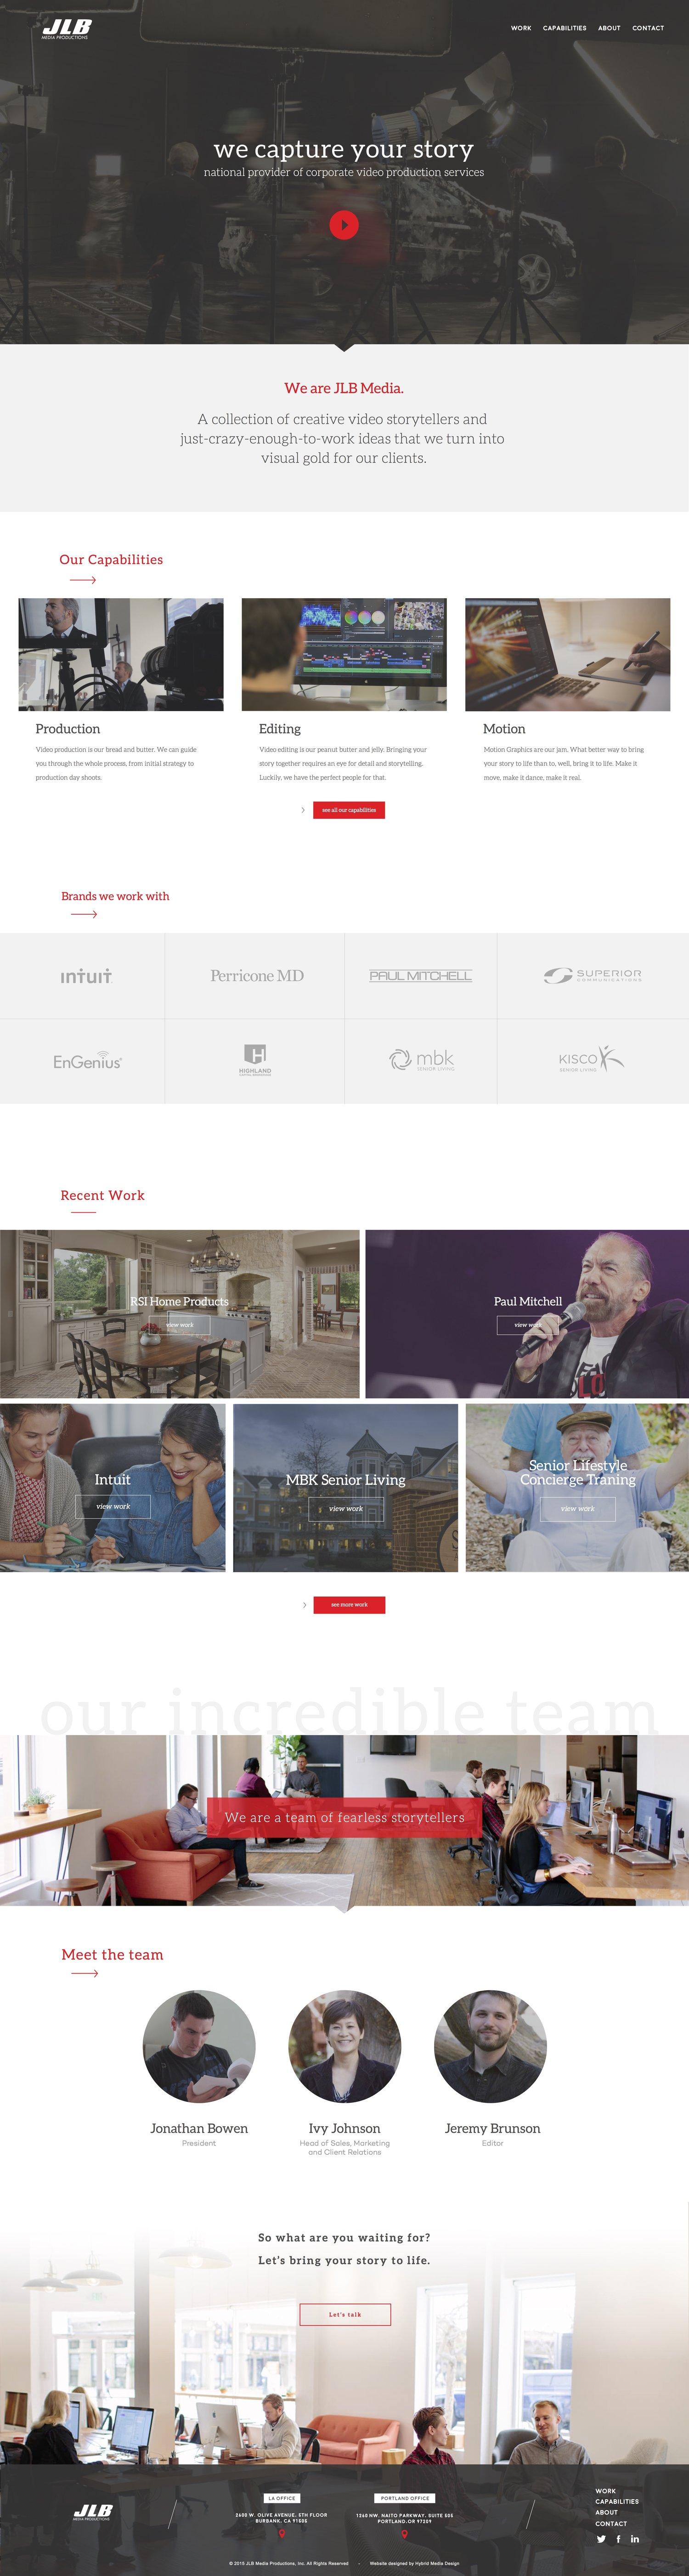 Web Design | JLB Media - Homepage (Desktop View)